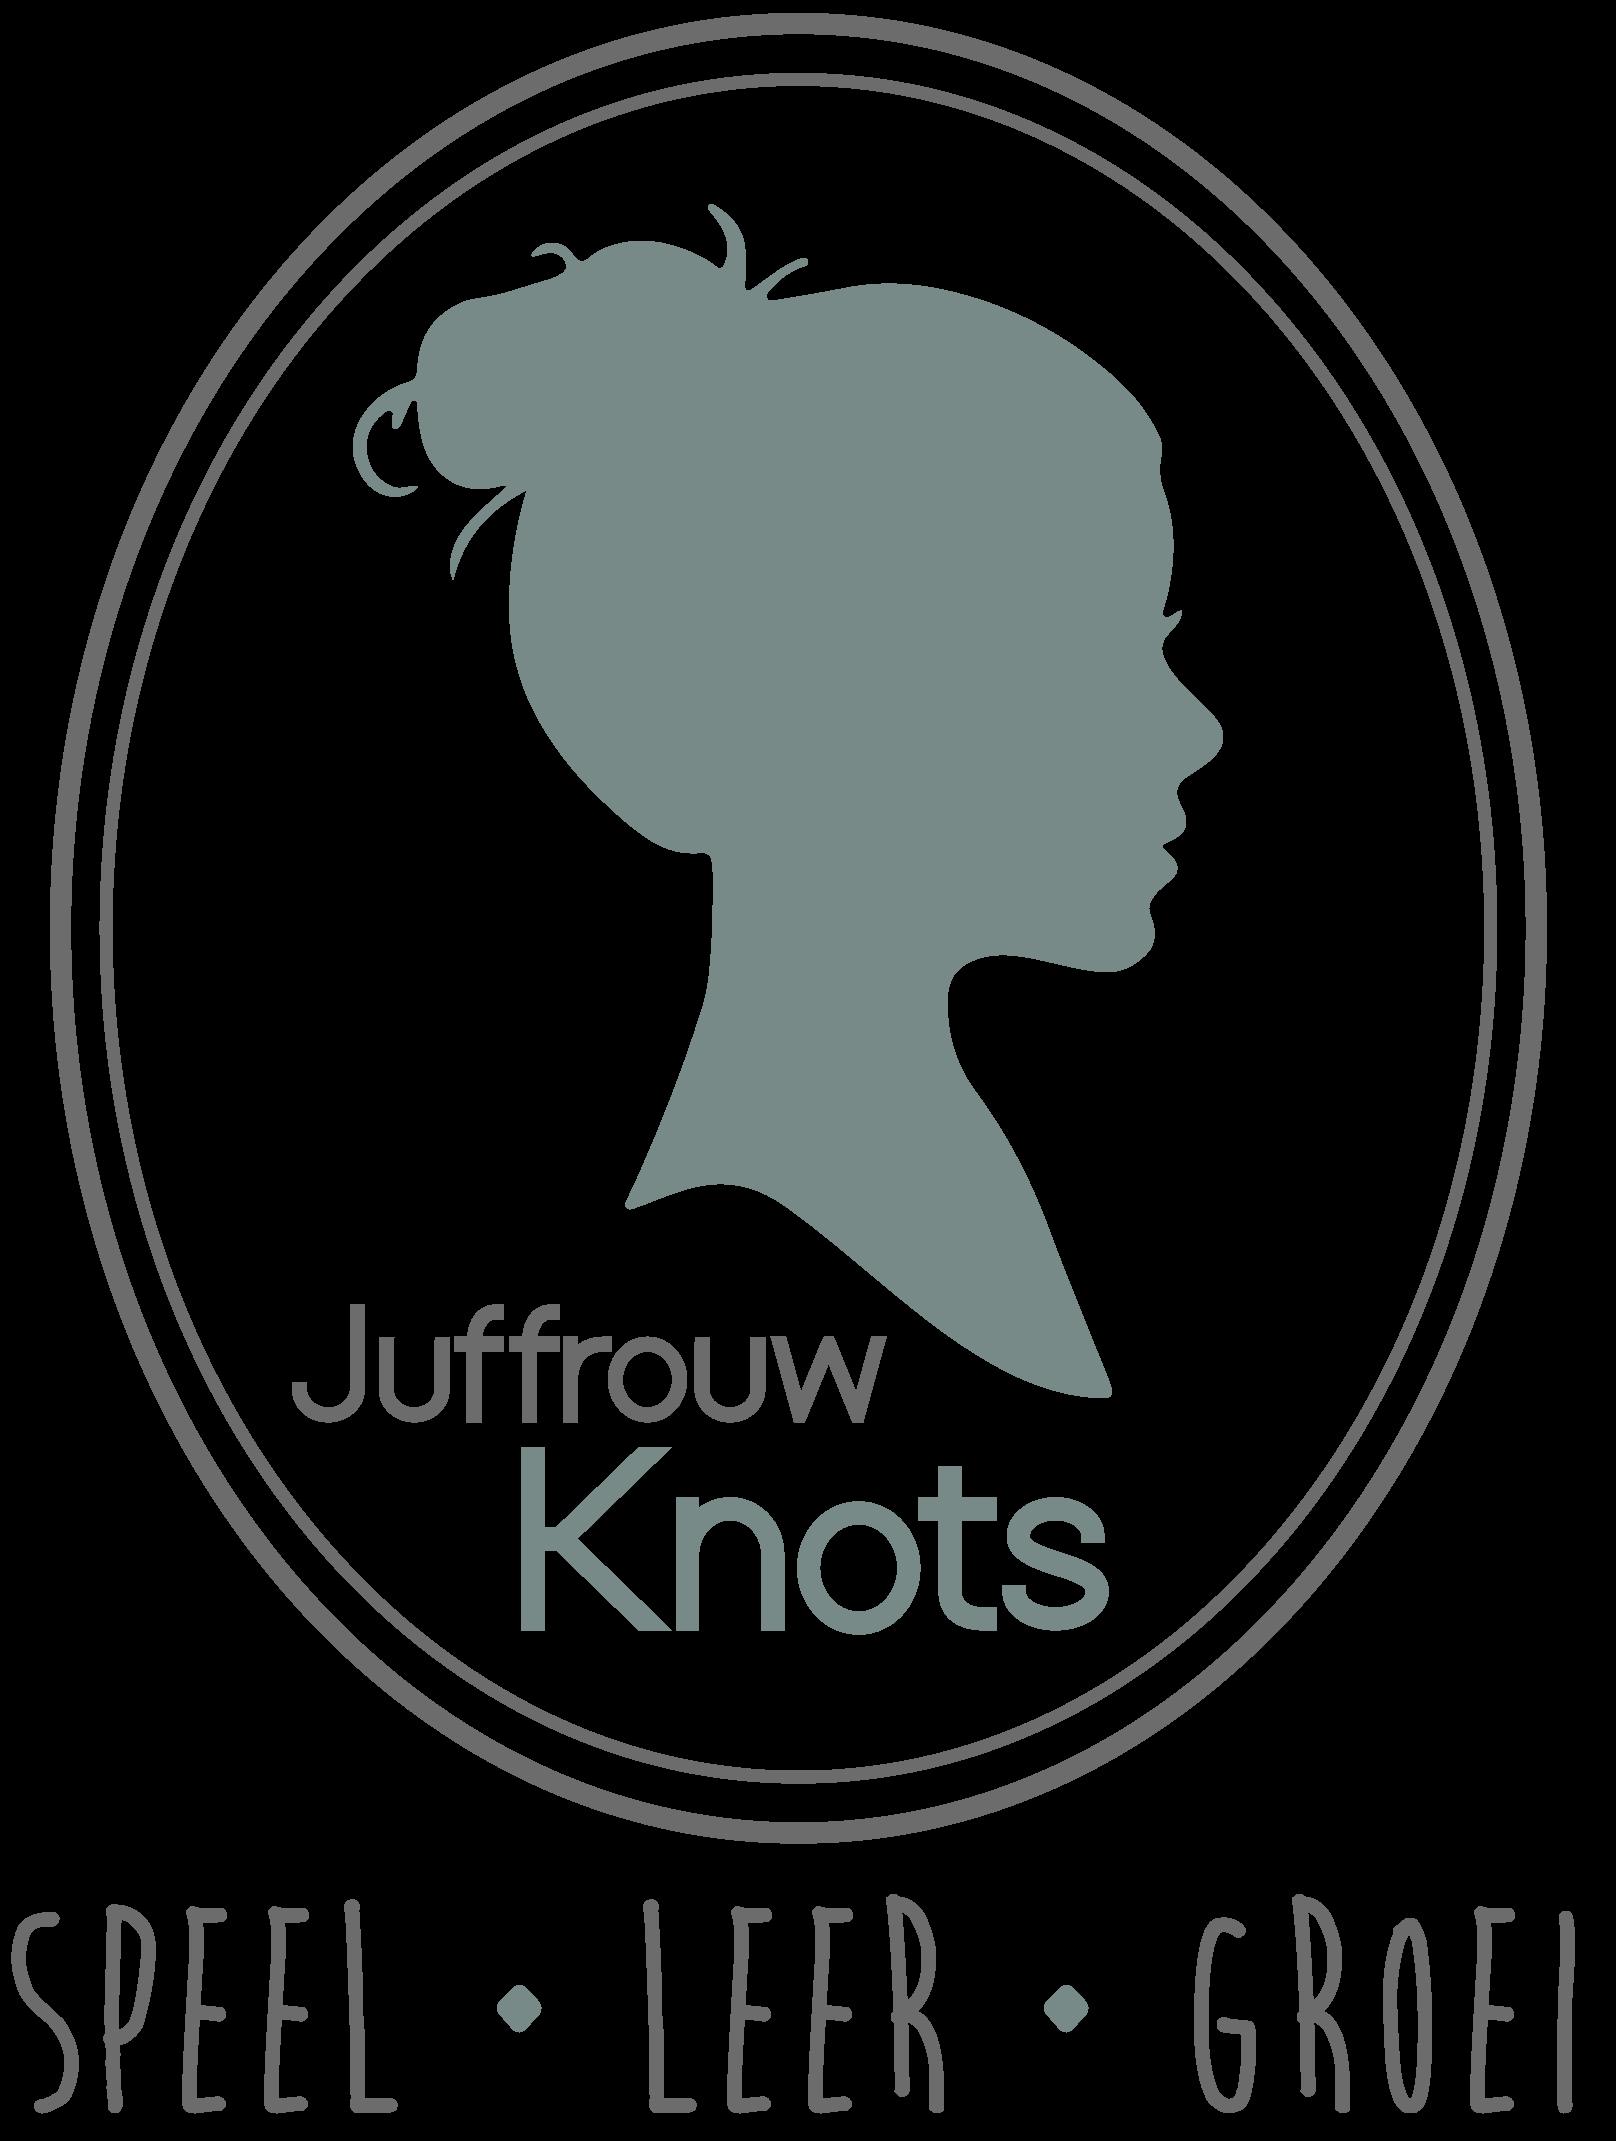 Juffrouw Knots